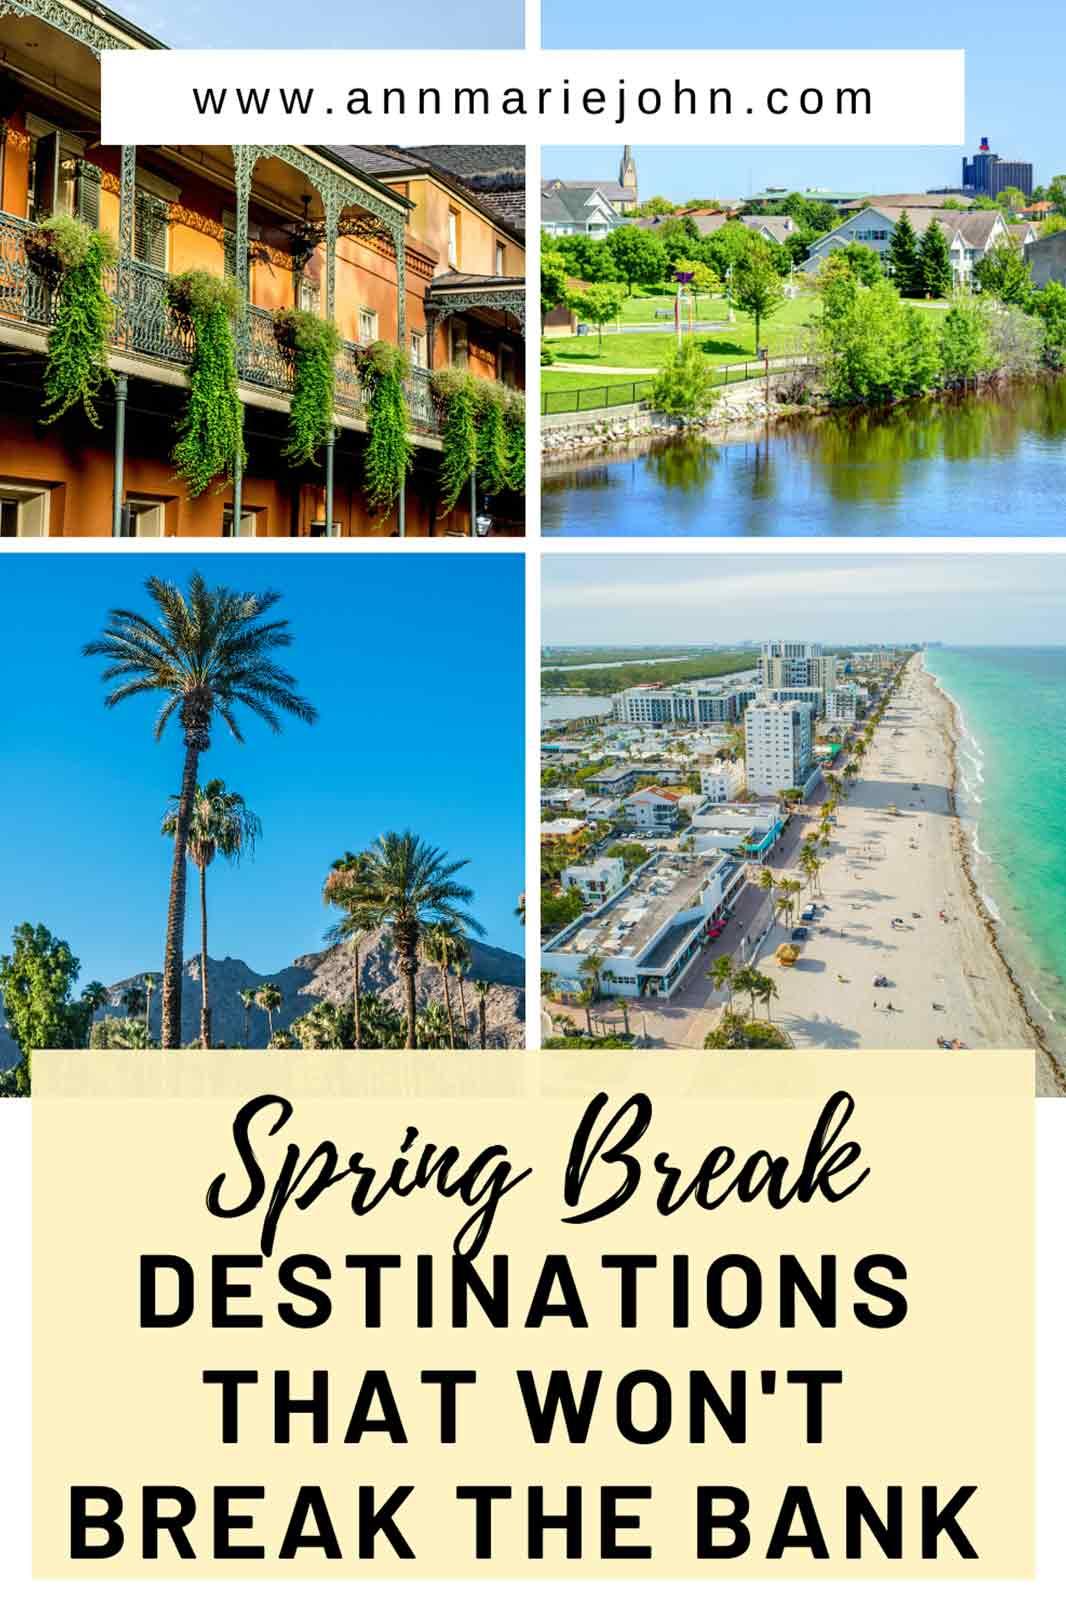 Spring Break Destinations That Won't Break the Bank